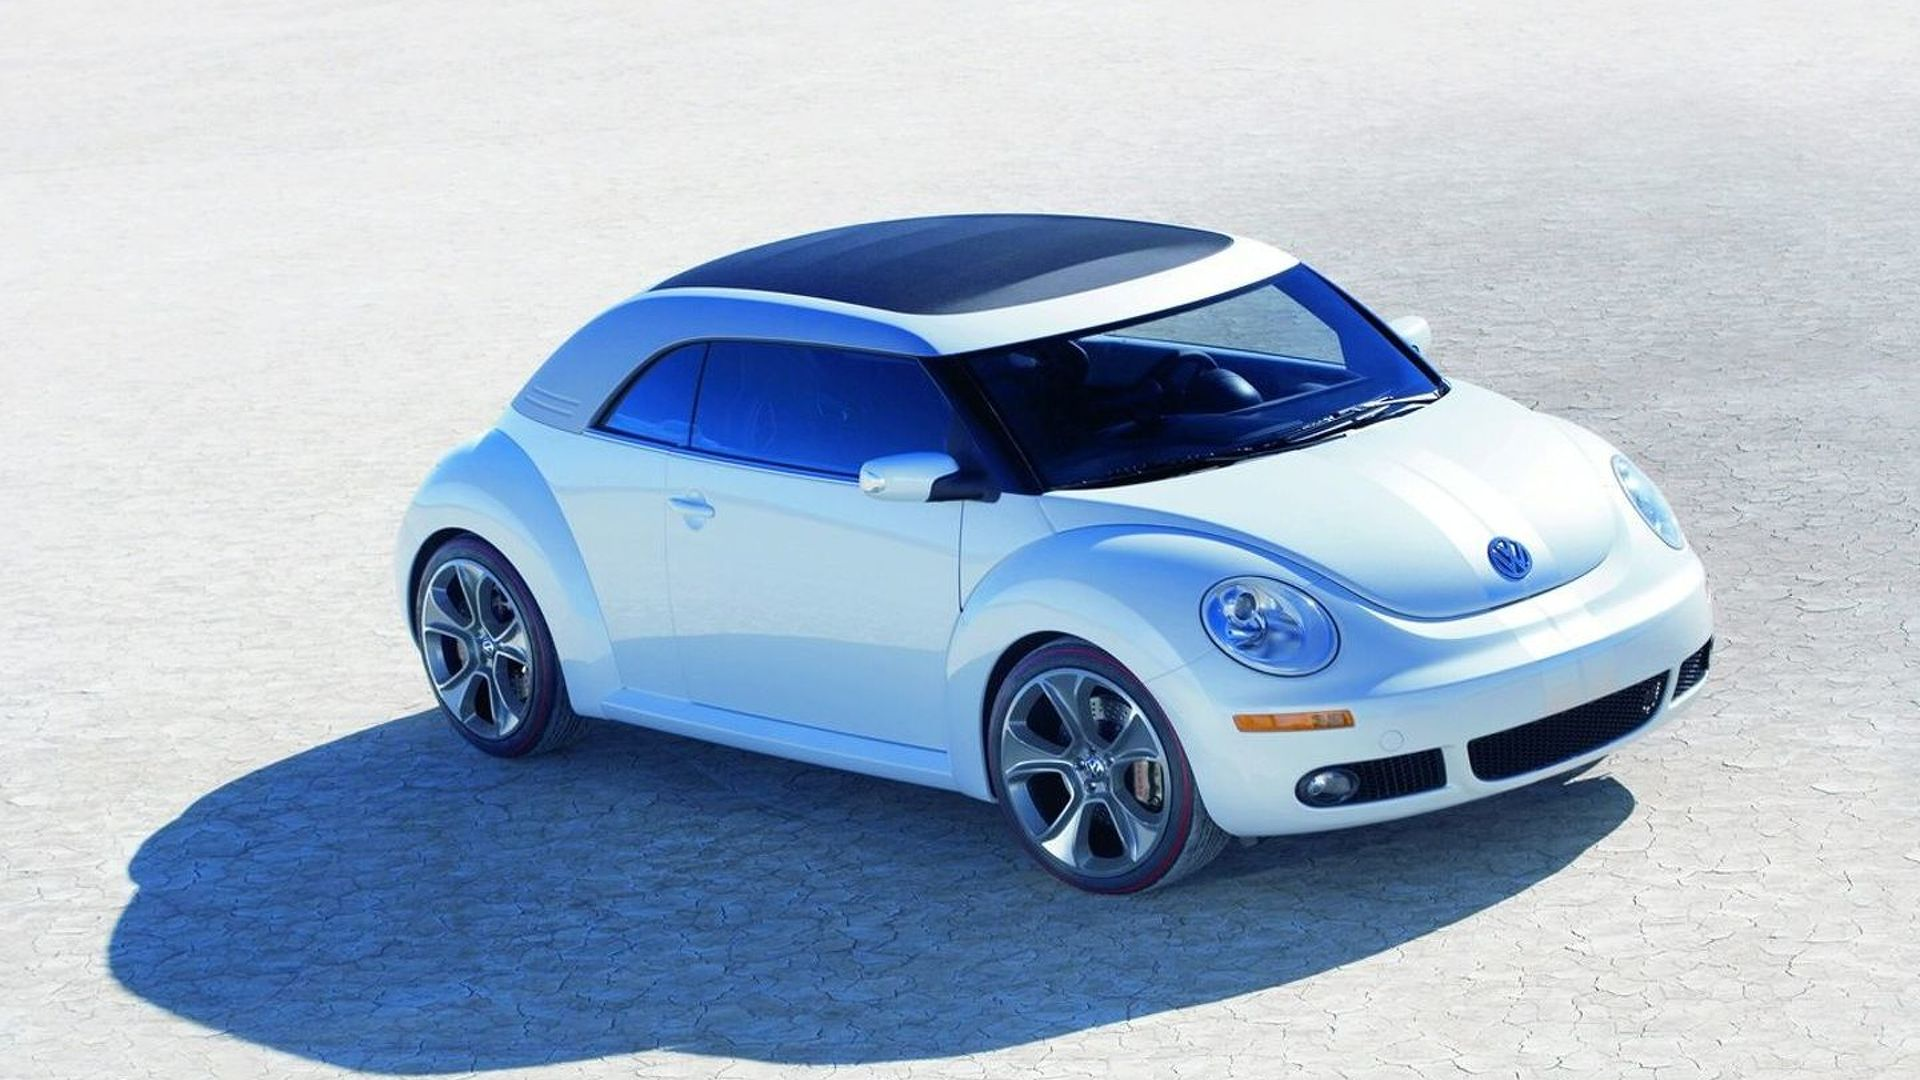 New Beetle Variants Coming?